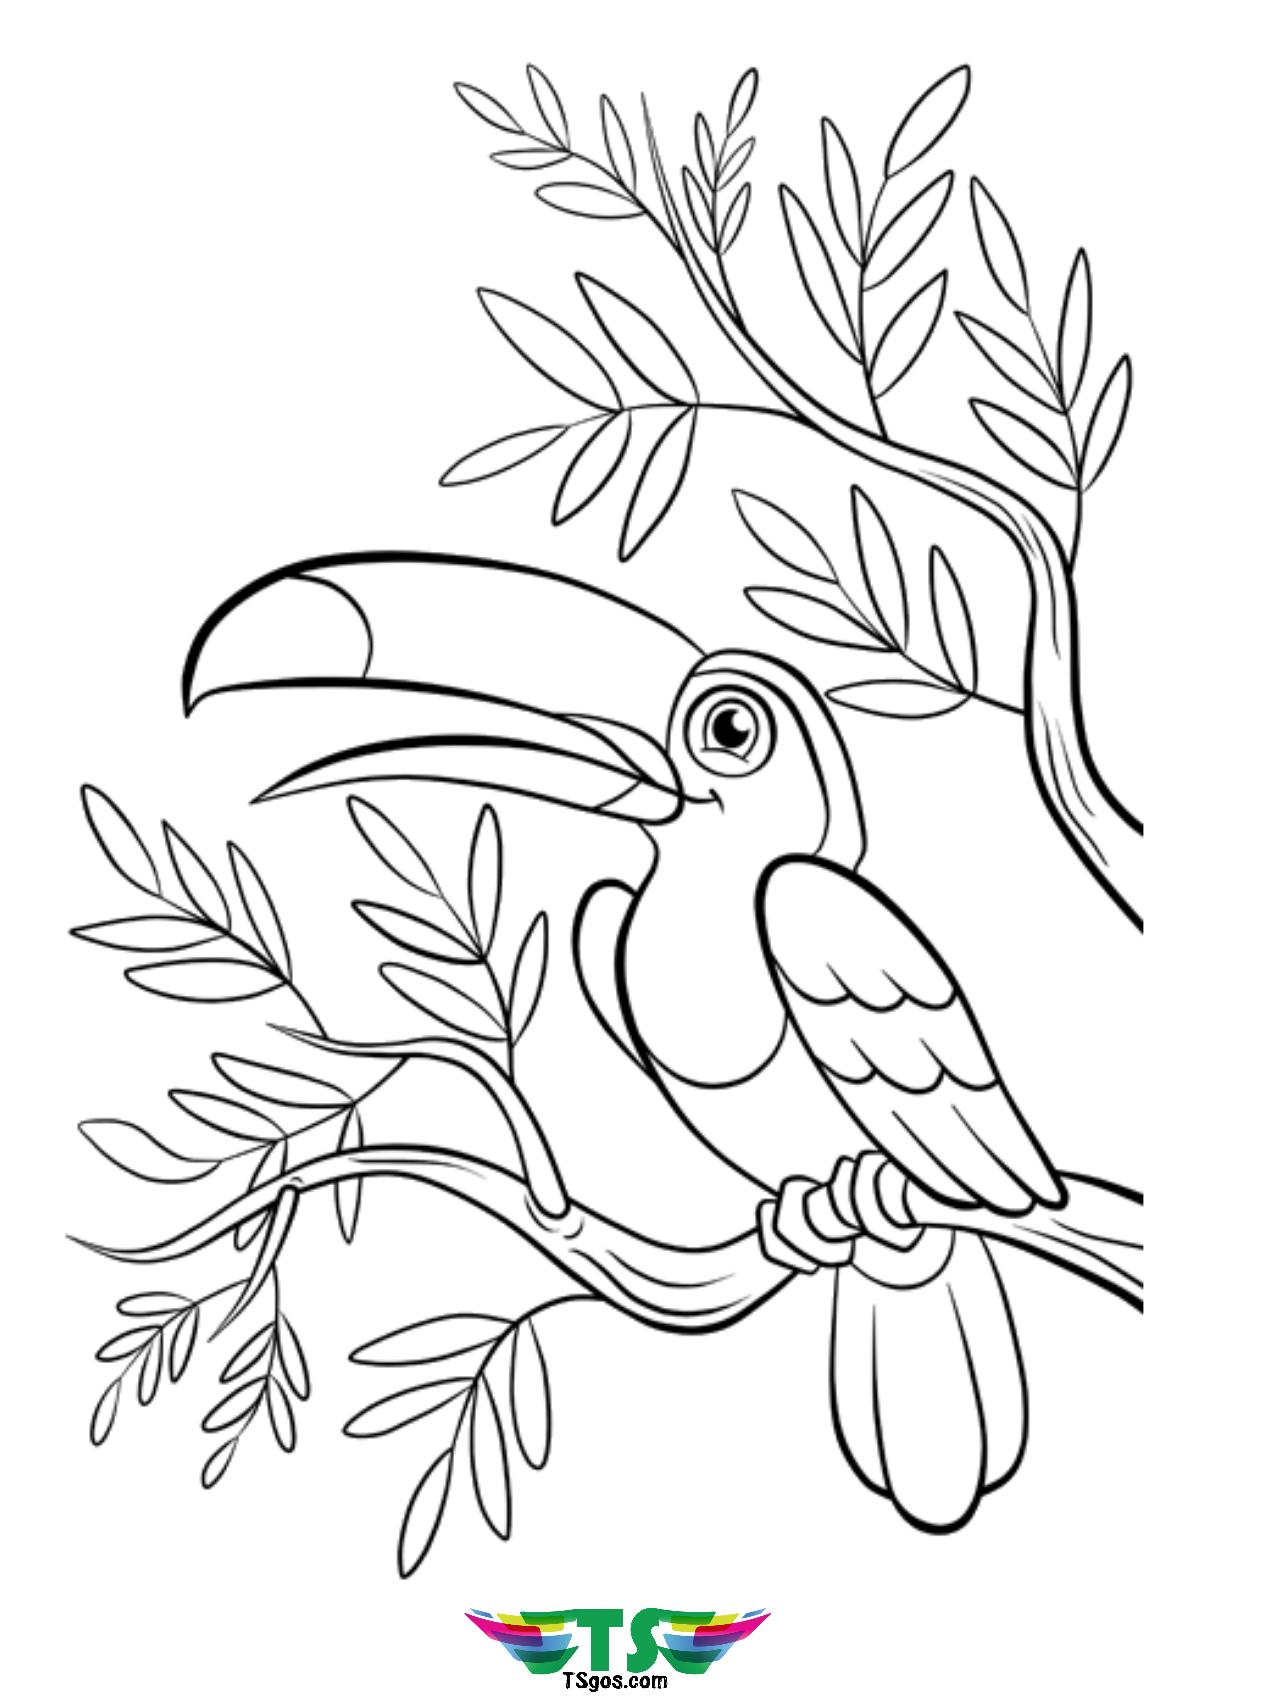 Beautiful bird coloring page free download. - TSgos.com